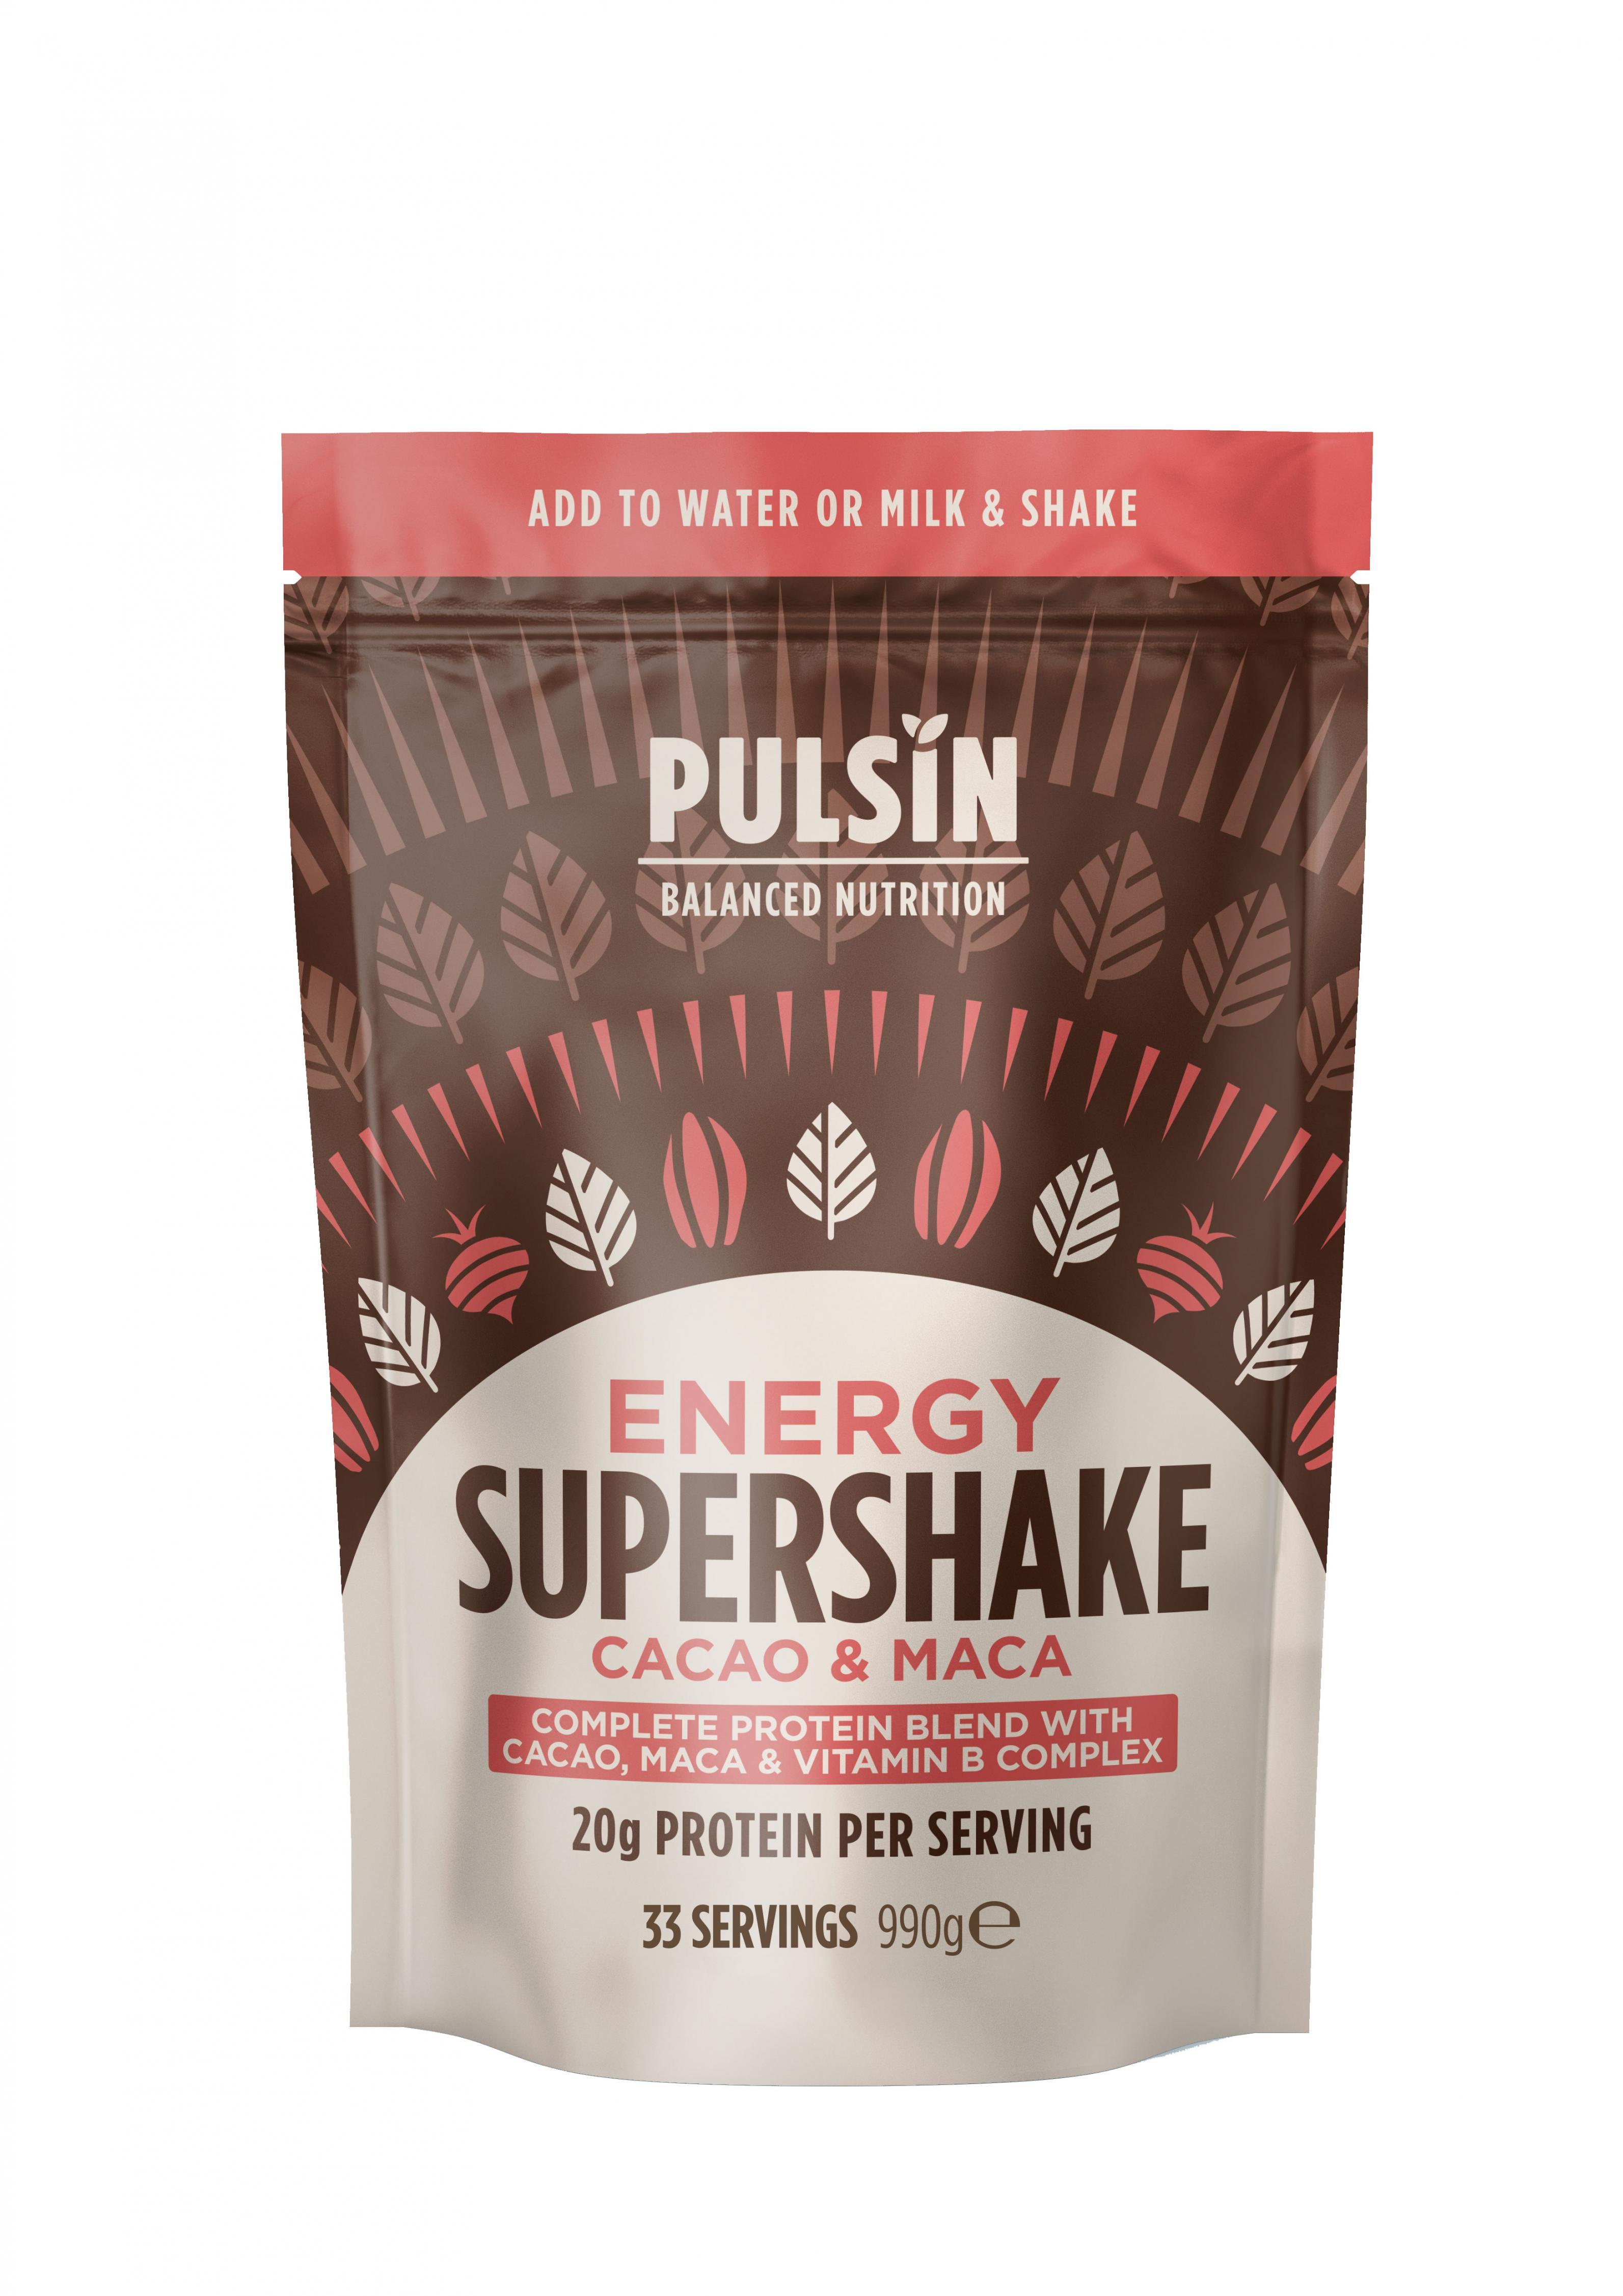 Energy Supershake Cacao & Maca 990g